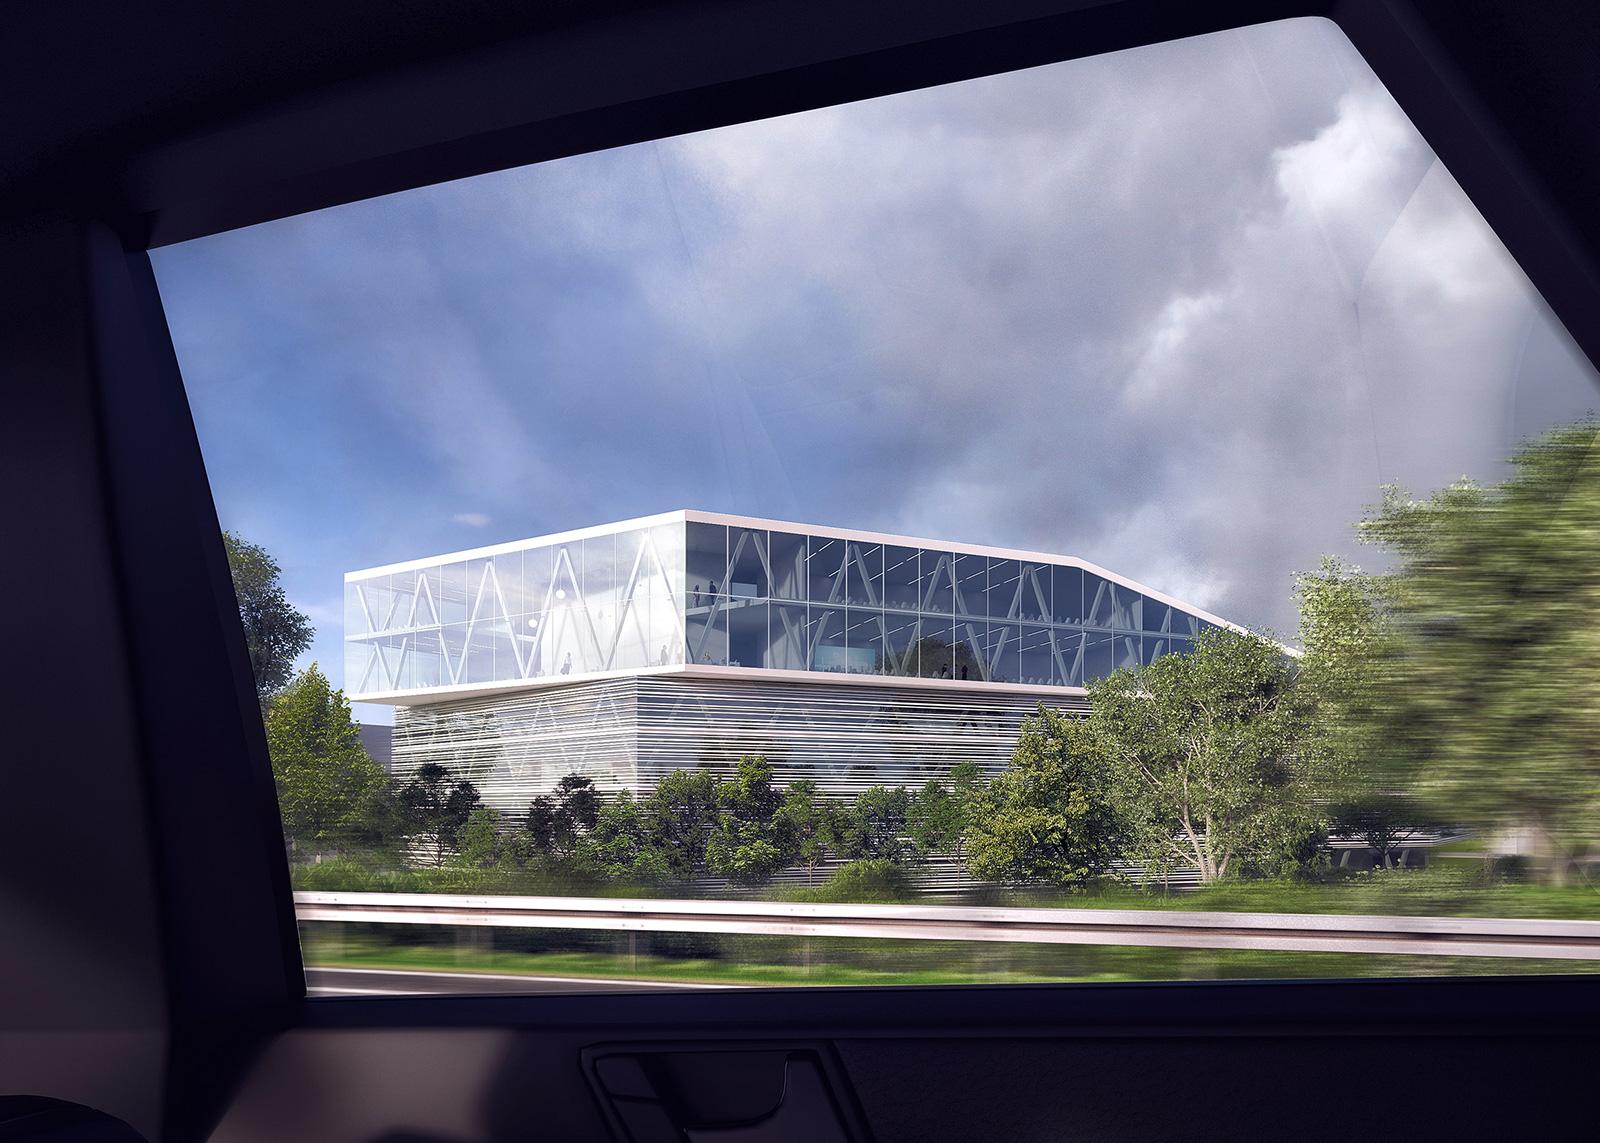 visualisation_no3_WBA_SEHW SEHW Architektur GmbH}